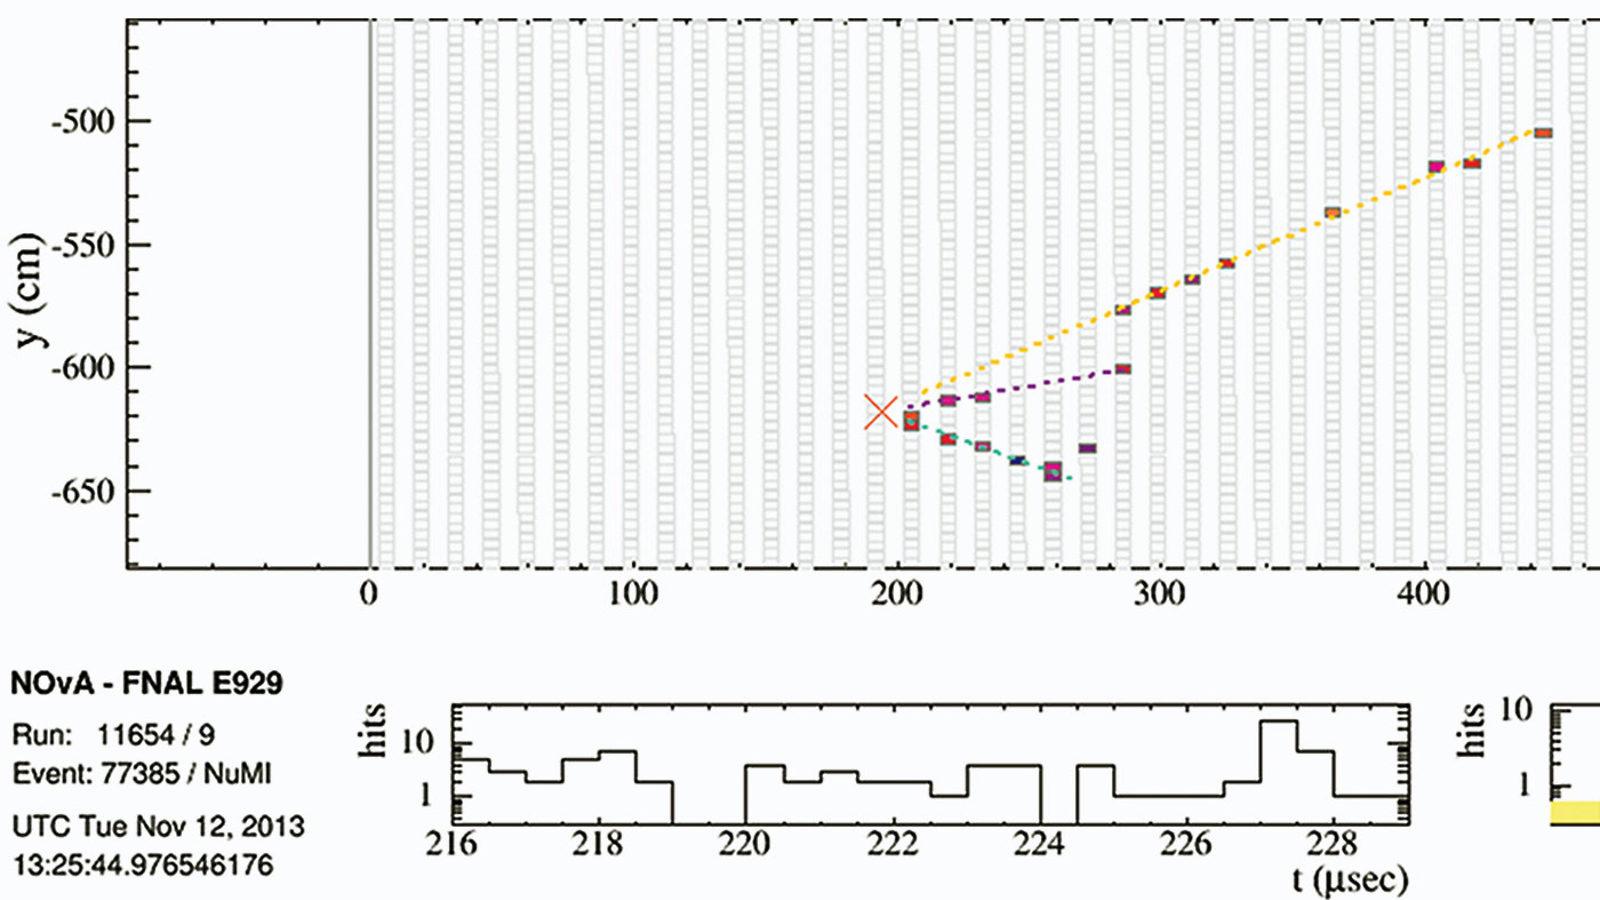 logbook: NOvA's First Neutrino